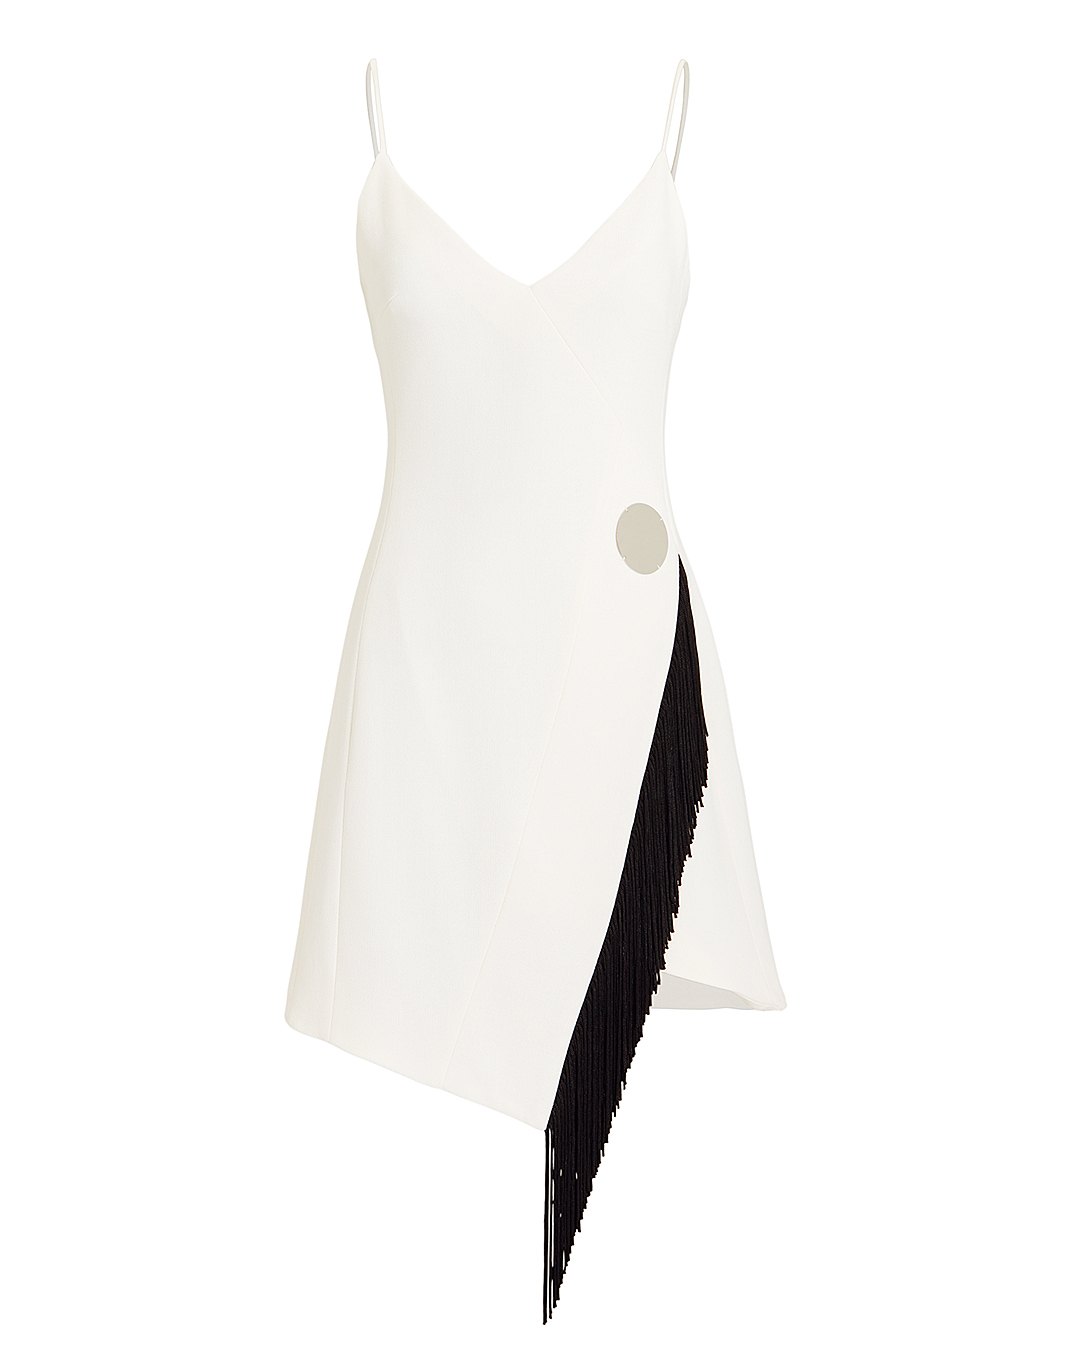 DAVID KOMA FRINGE DETAIL WHITE CAMI DRESS BLK/WHT